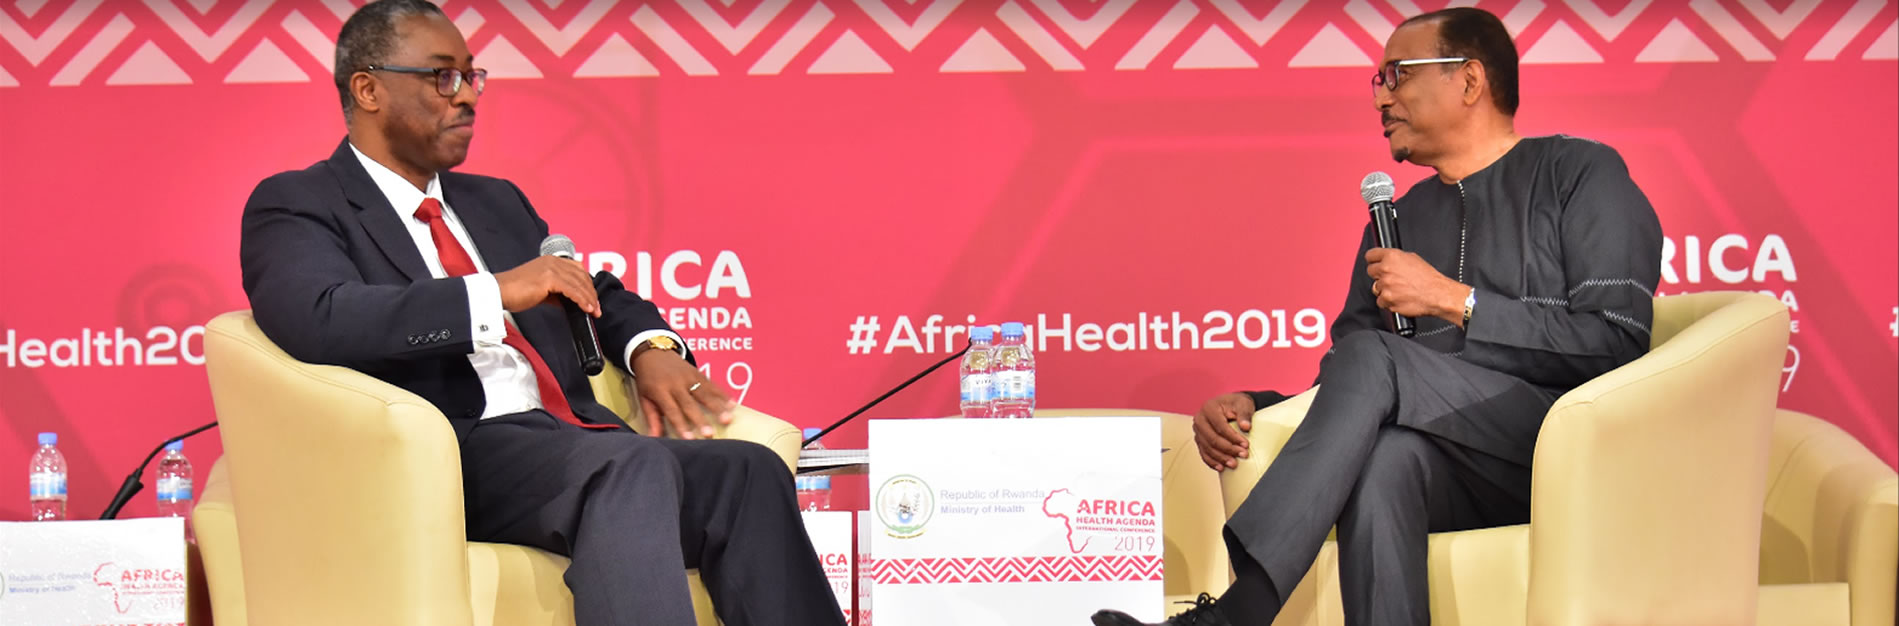 Africa Health 2019 Conference in Kigali, Rwanda Michel Sidibe